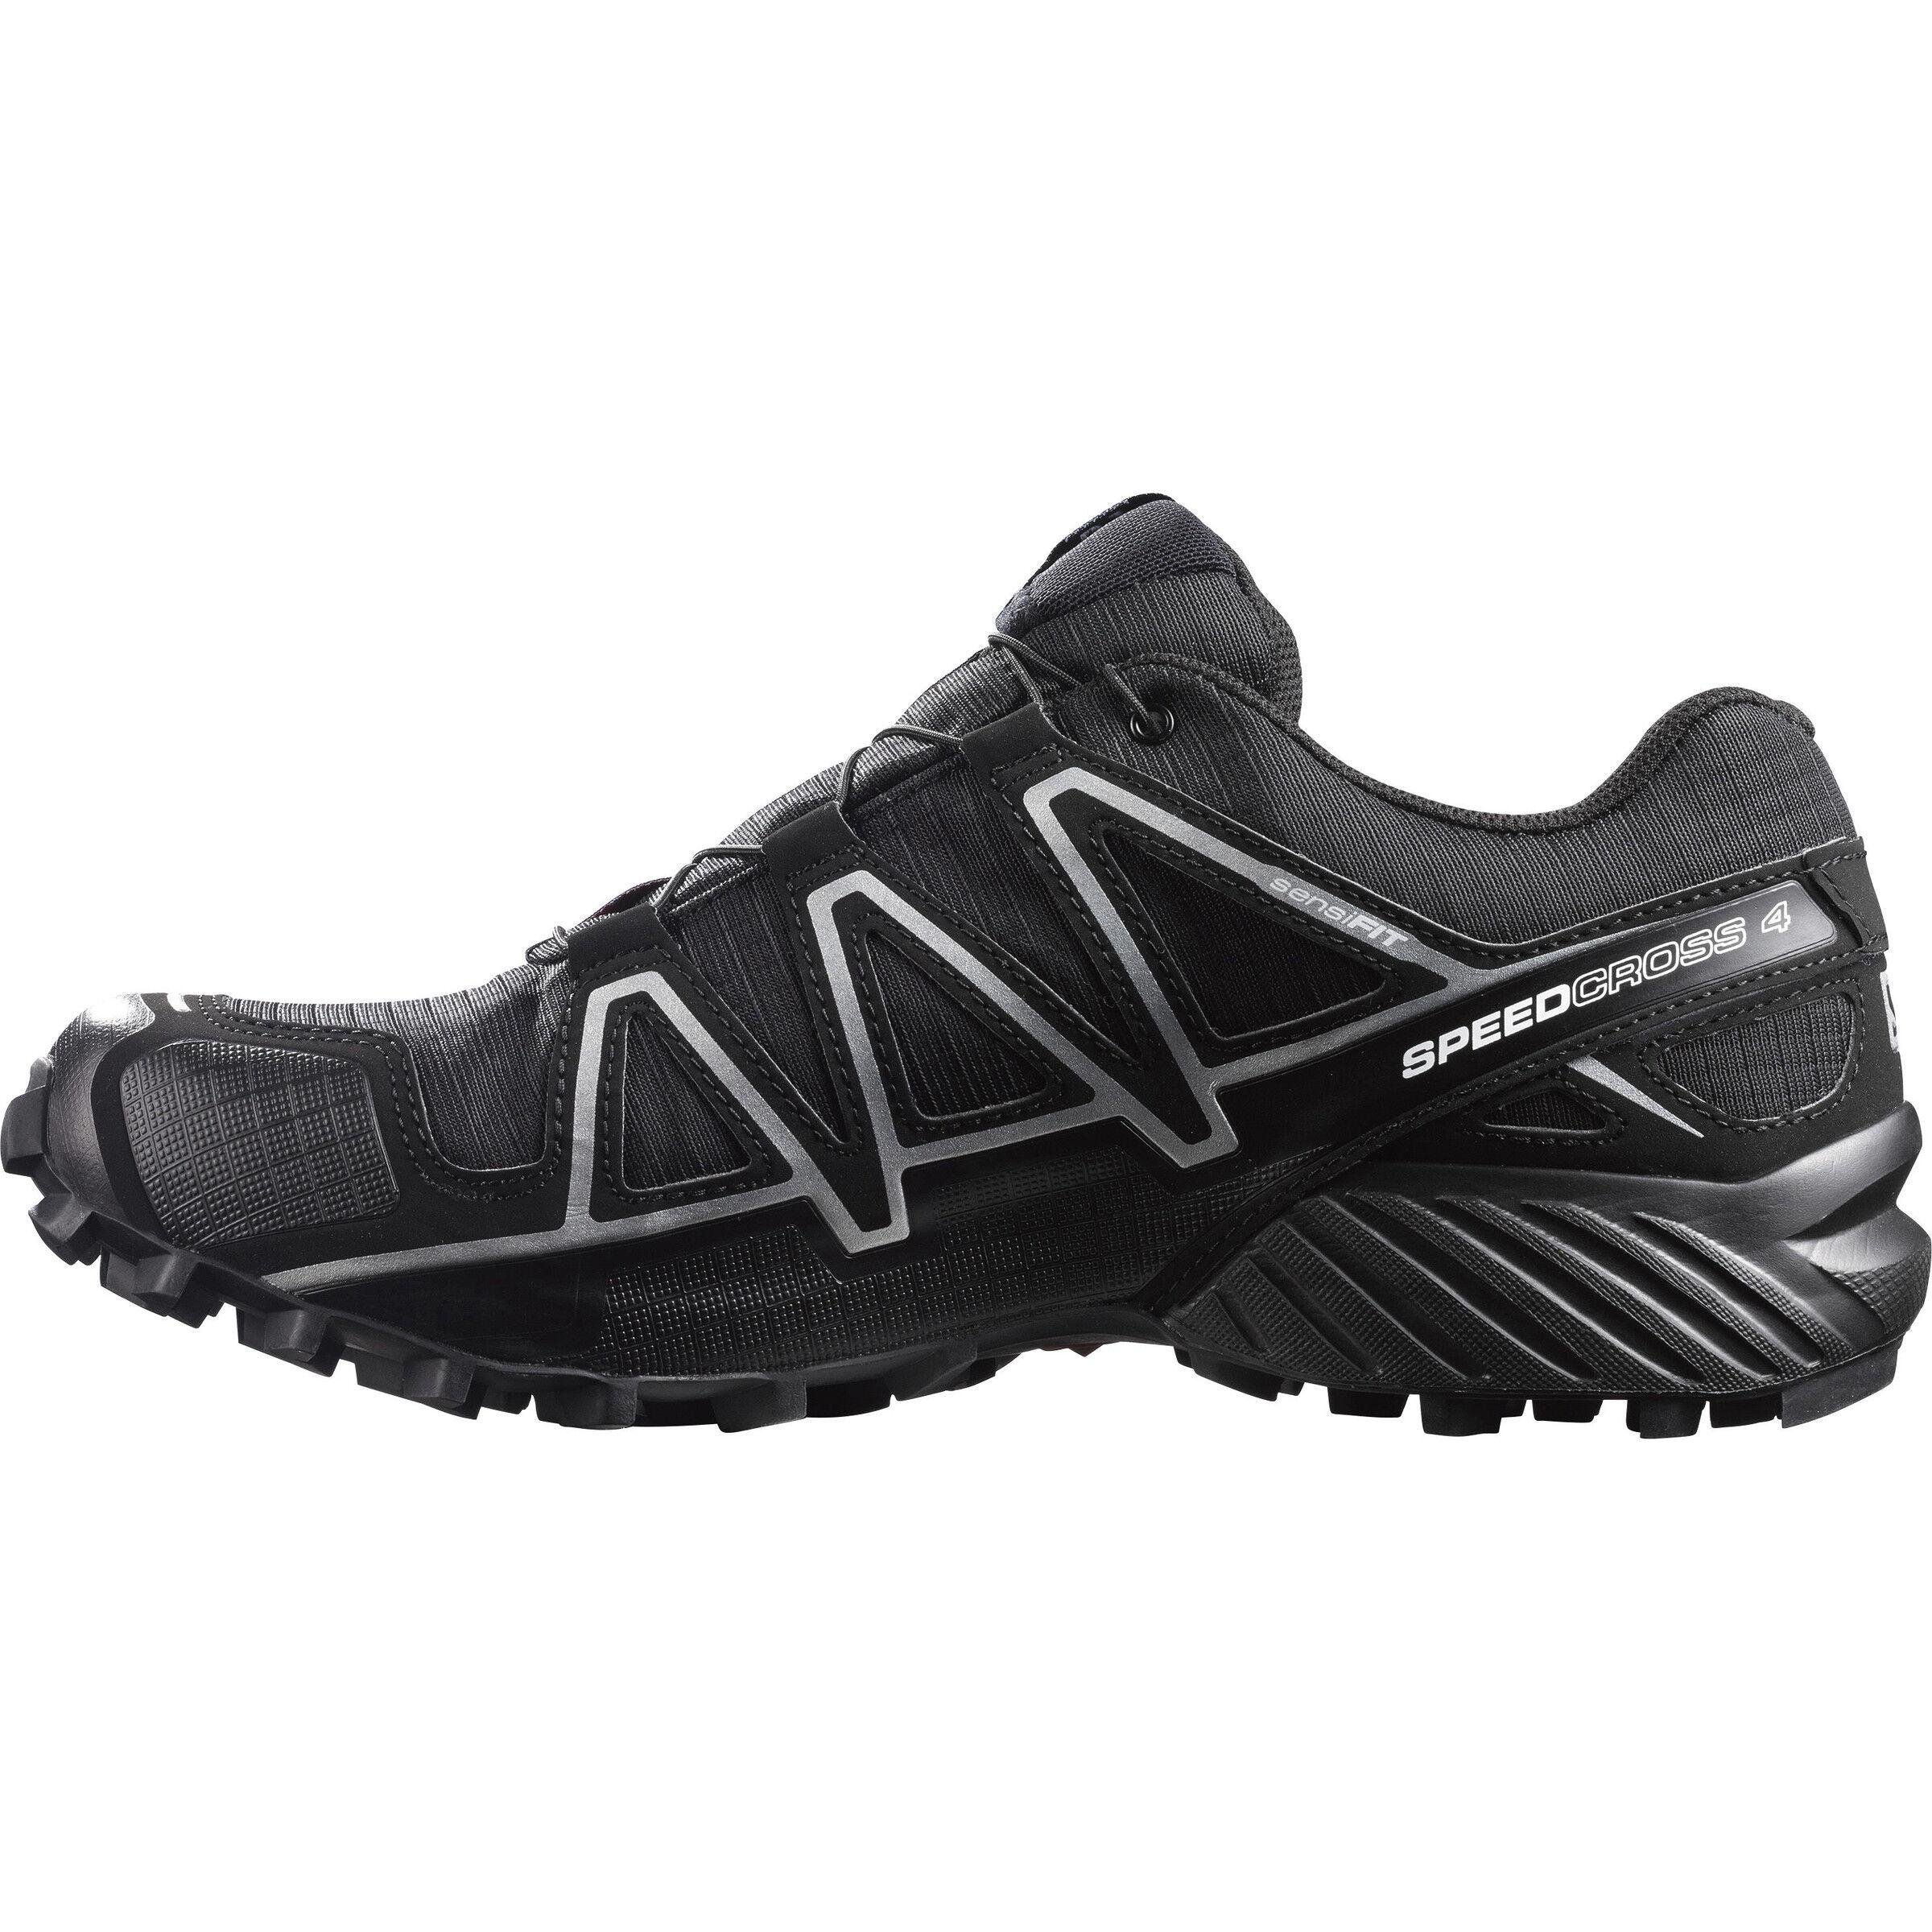 4 Gtx Salomon Speedcross Shoes Herren Kaufen Online 1JK3lFcT